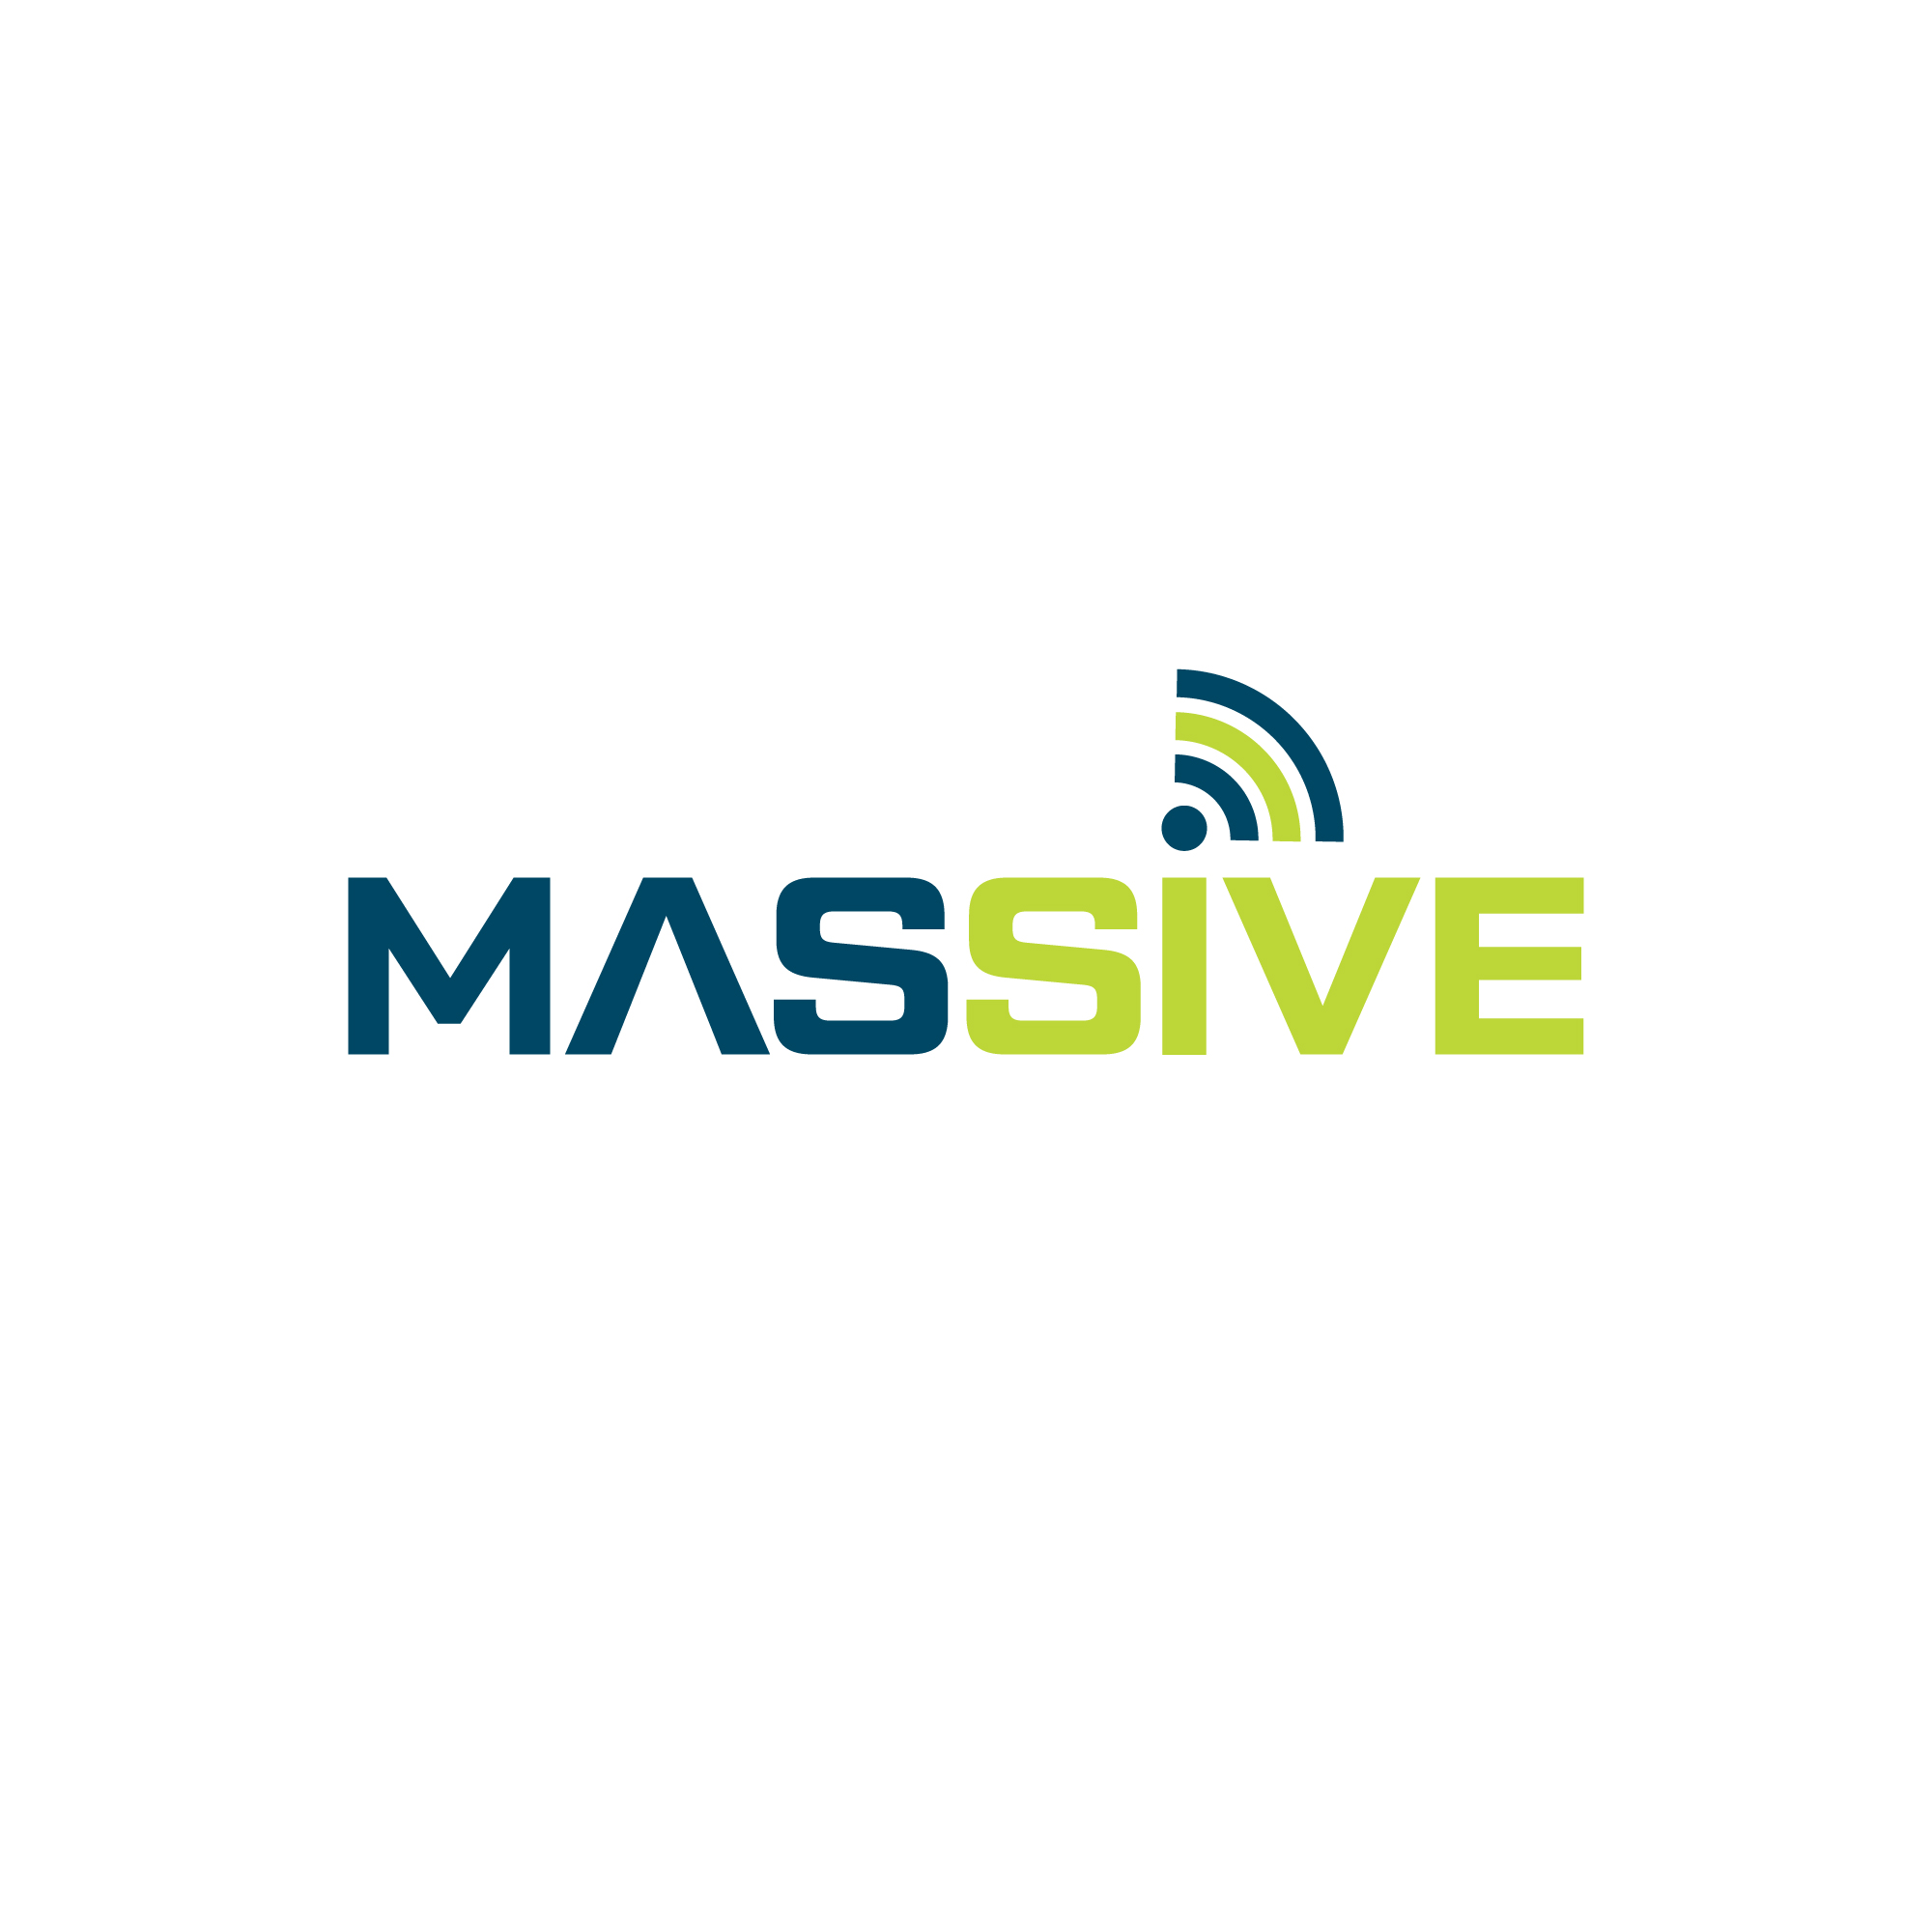 Logo Design by Zoran Lesevic - Entry No. 414 in the Logo Design Contest MASSIVE LOGO.